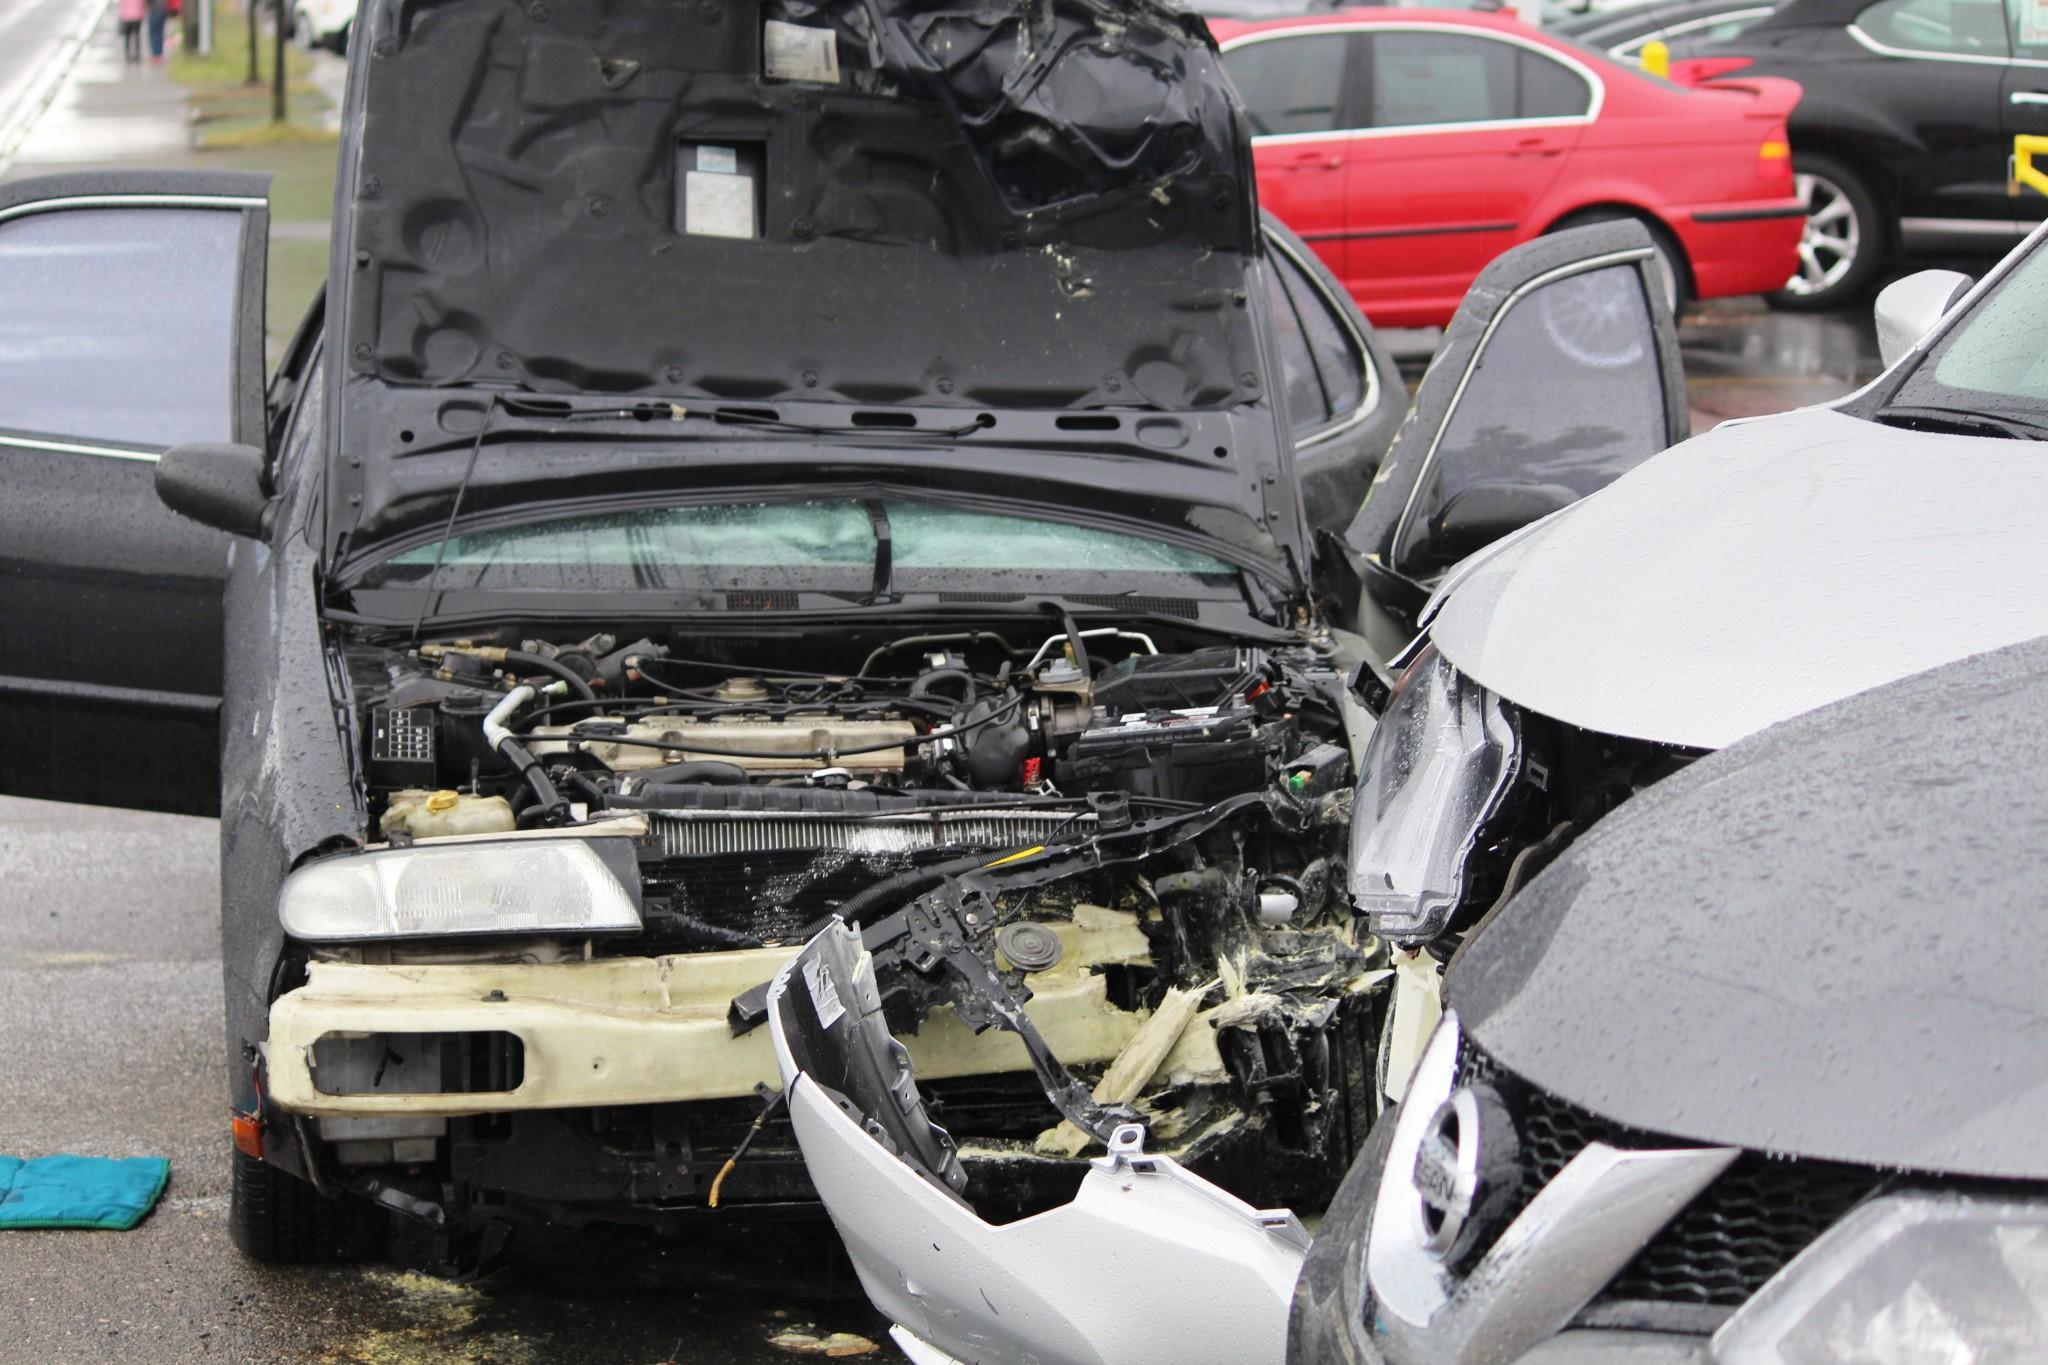 Crash and Fire at Everett Nissan Dealership Wrecks Five Cars ...